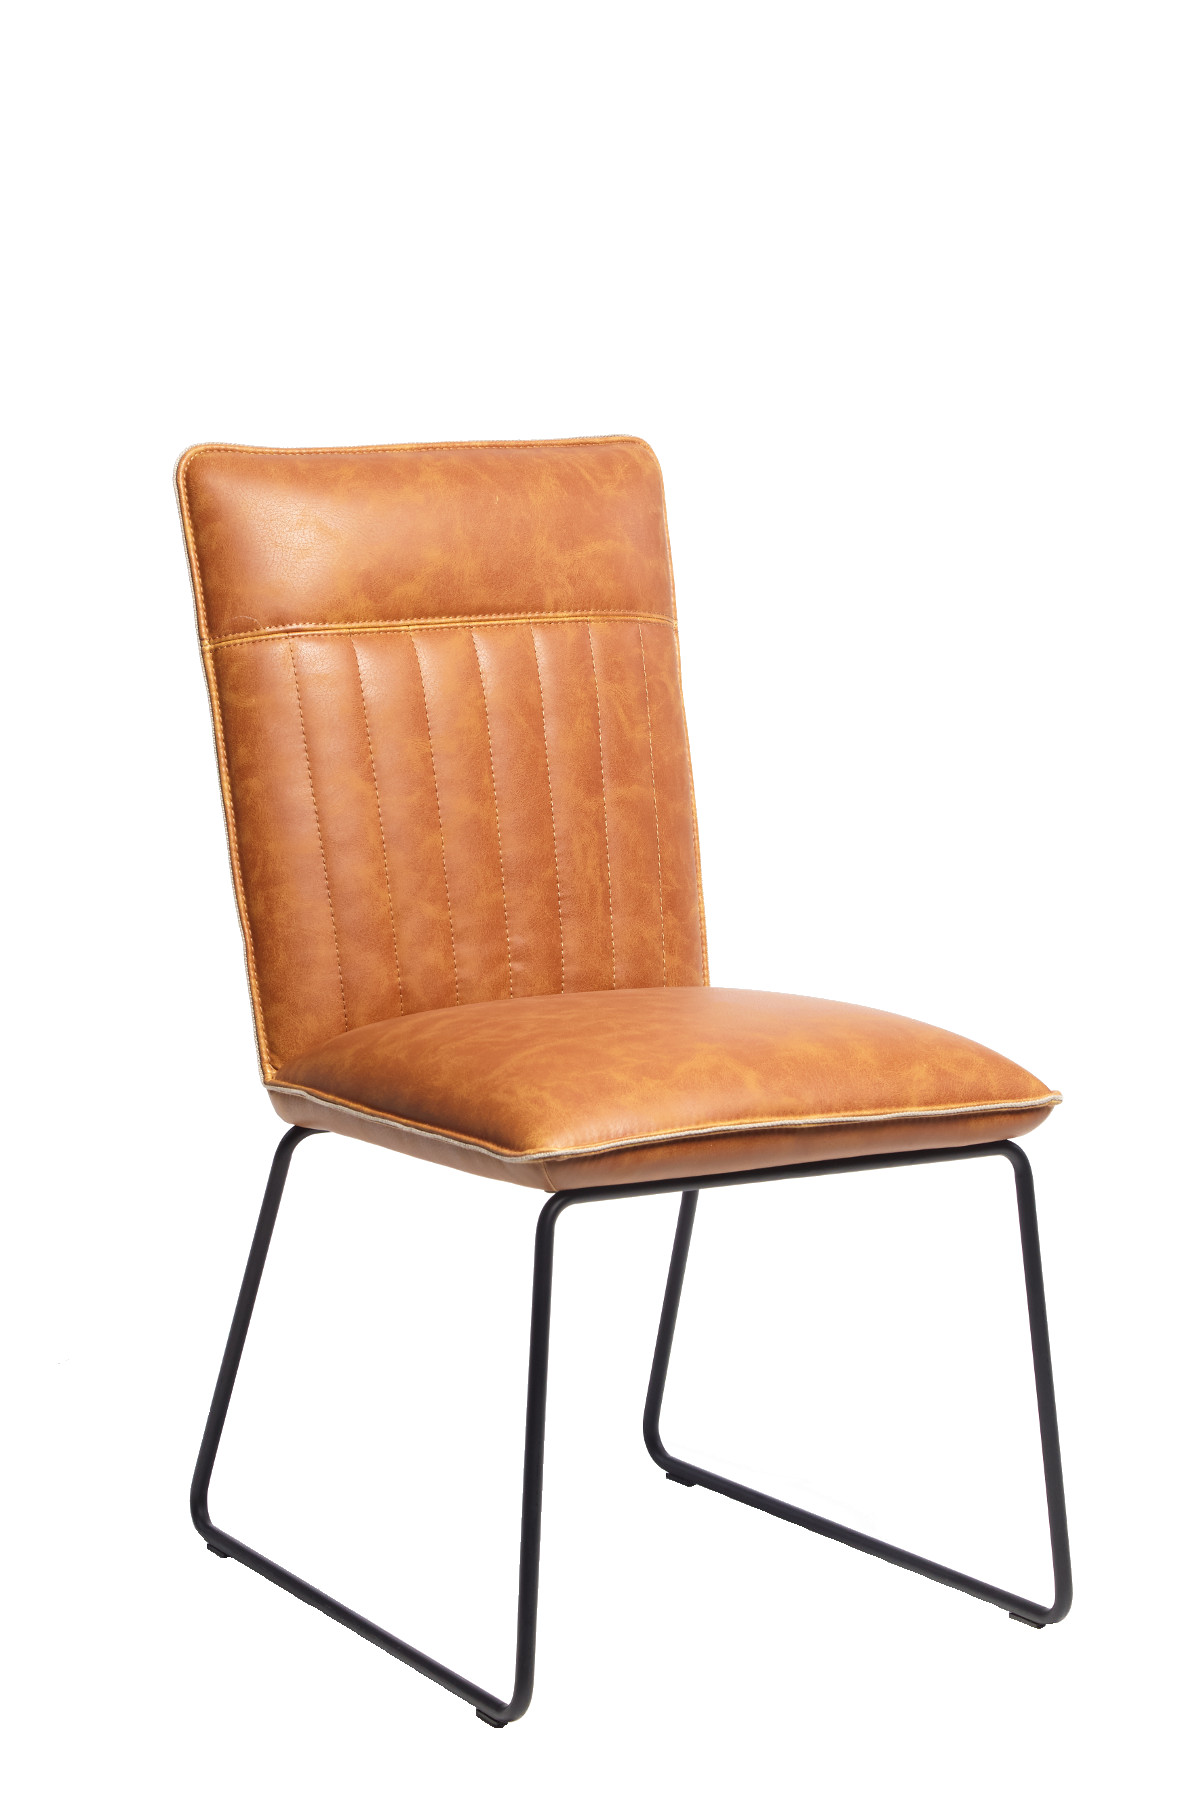 Jayden Tan Dining Chair